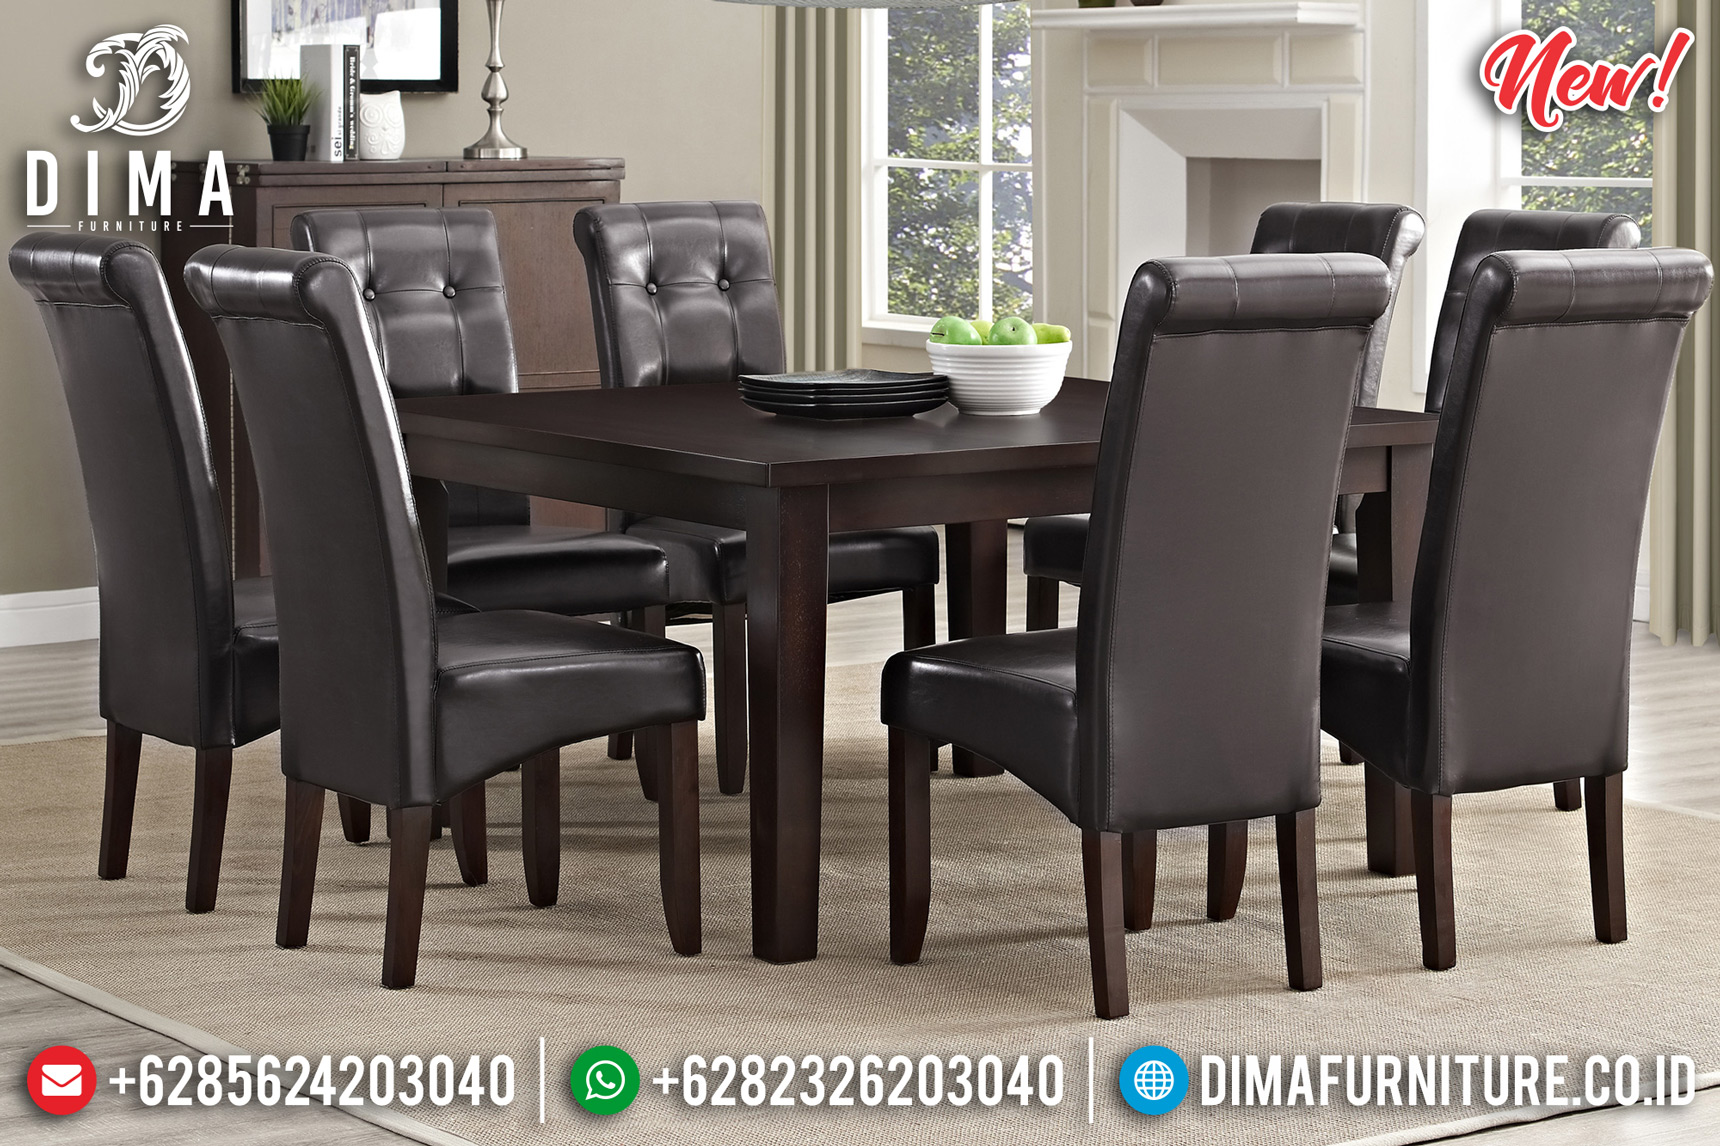 Classic Style Meja Makan Minimalis Jepara Natural Jati New Oscar Leather DF-1443